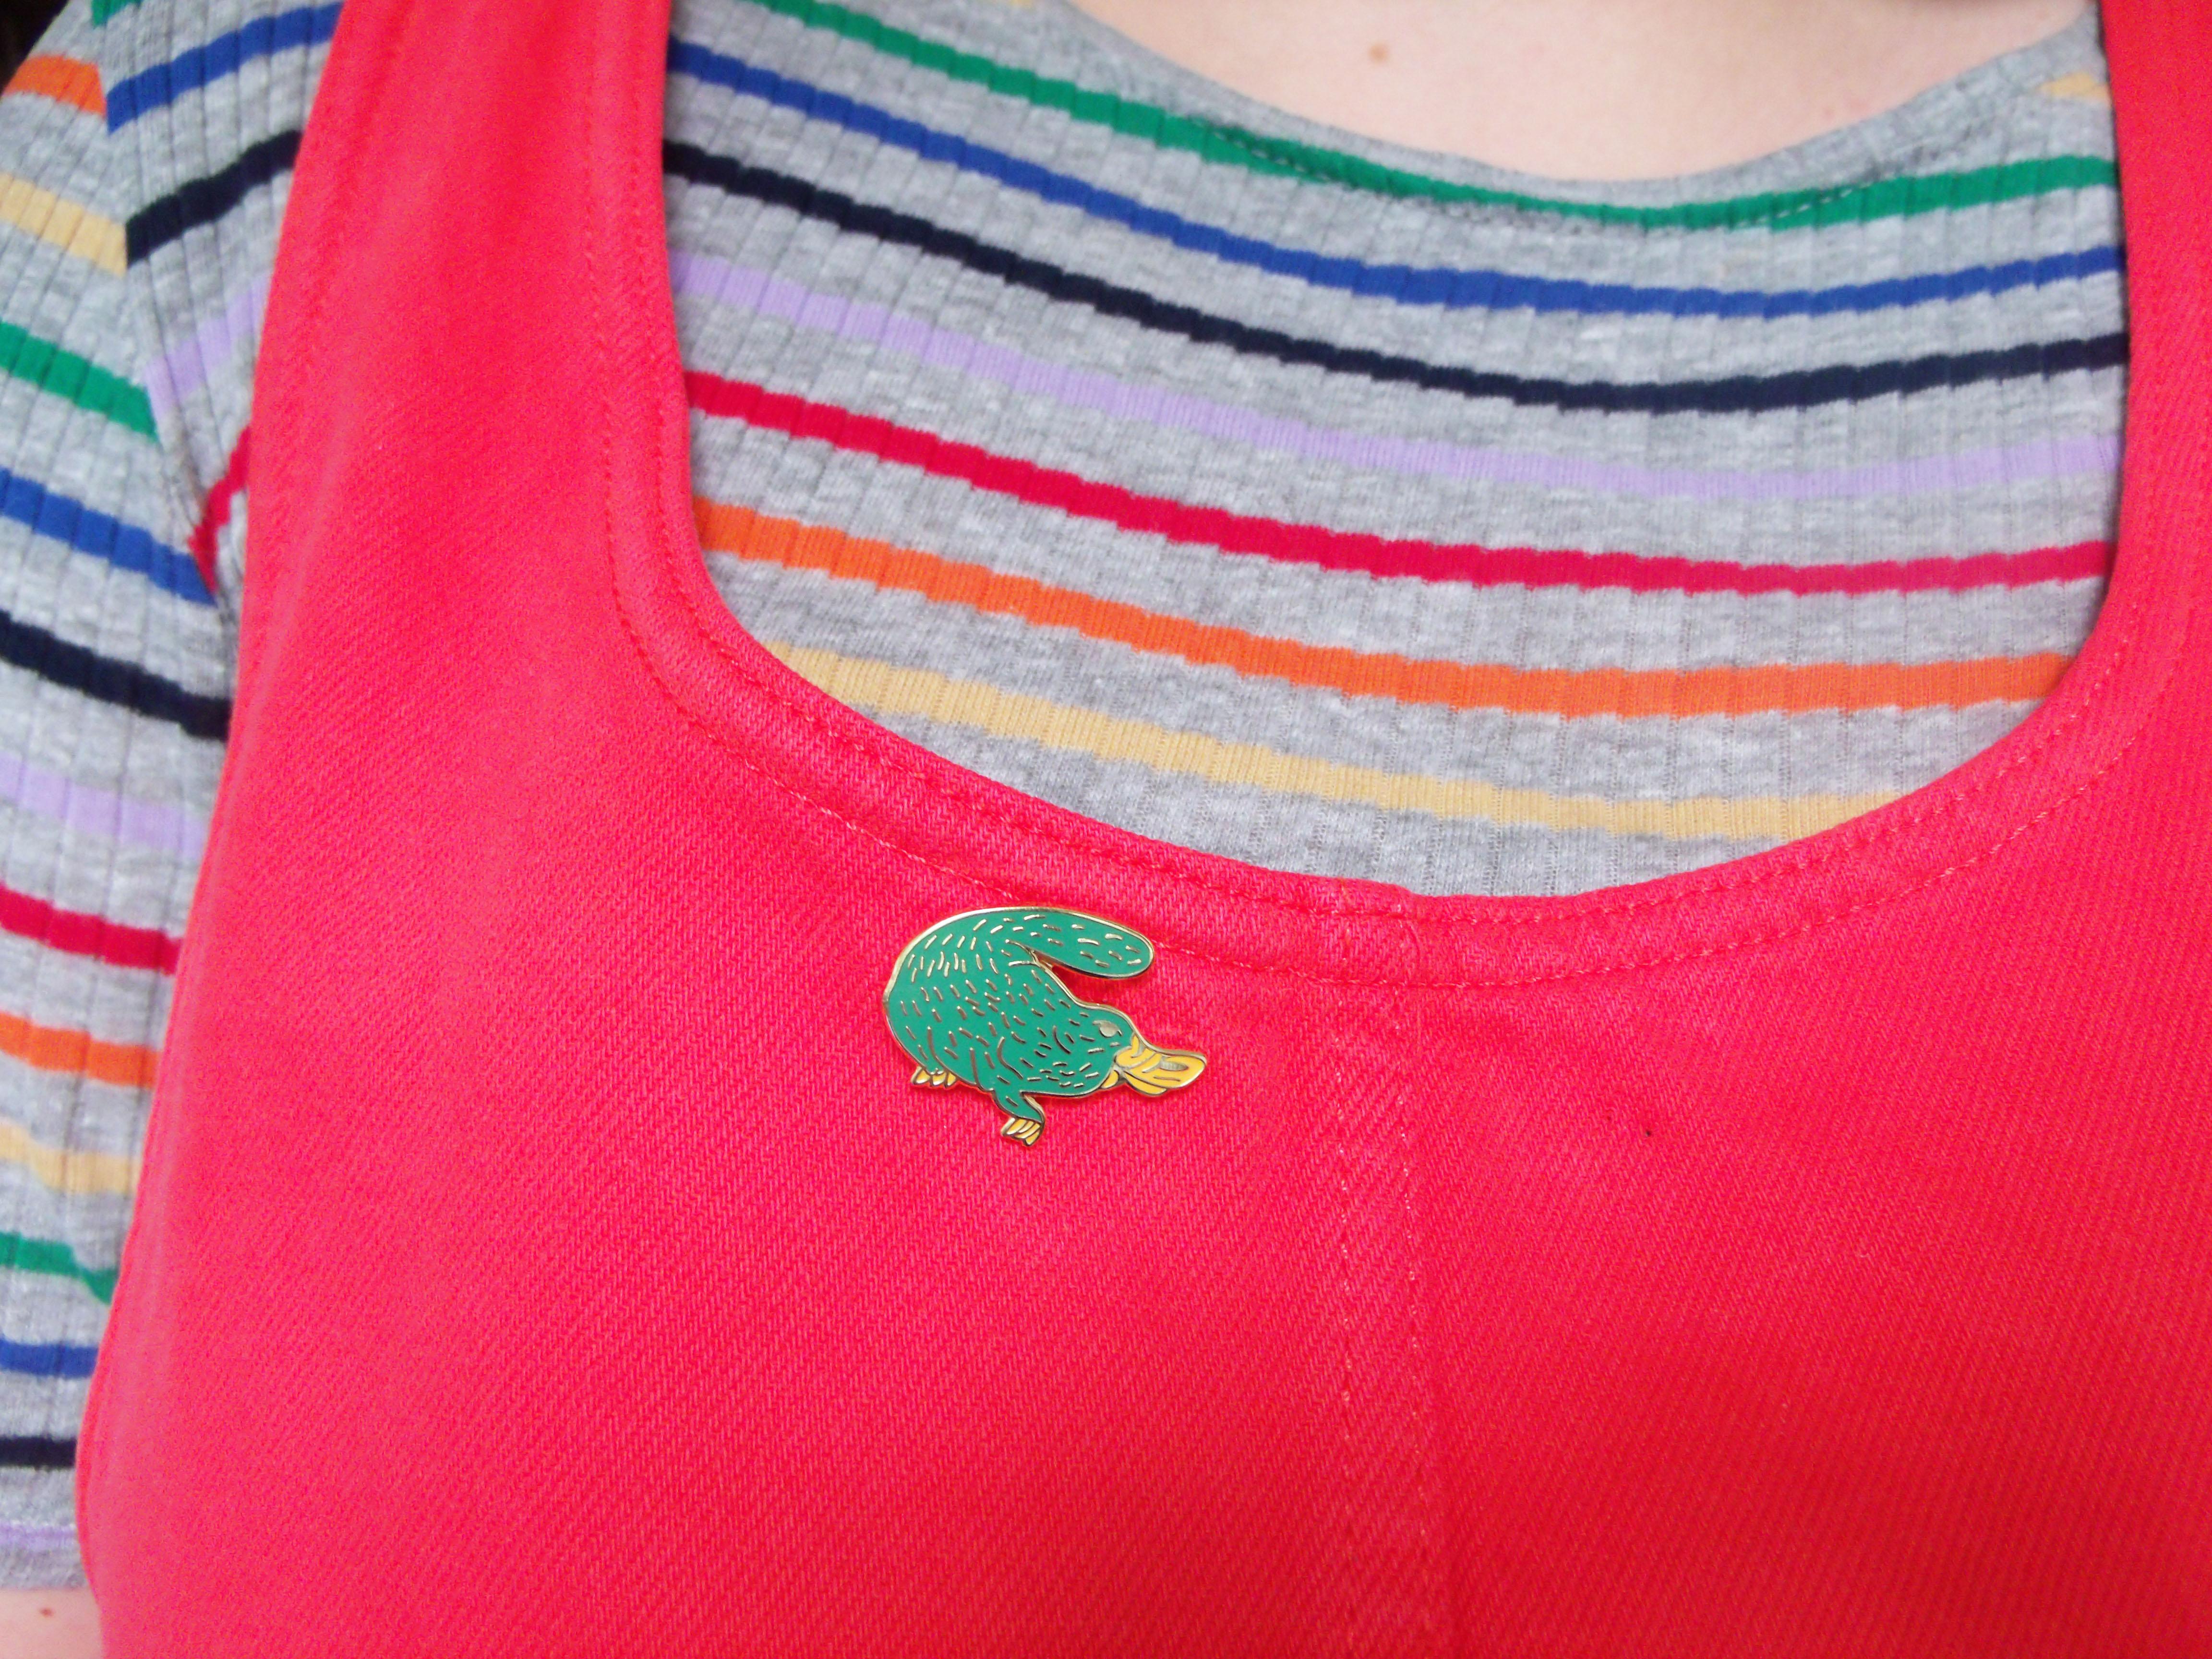 Pin badge by Sophie Heywood